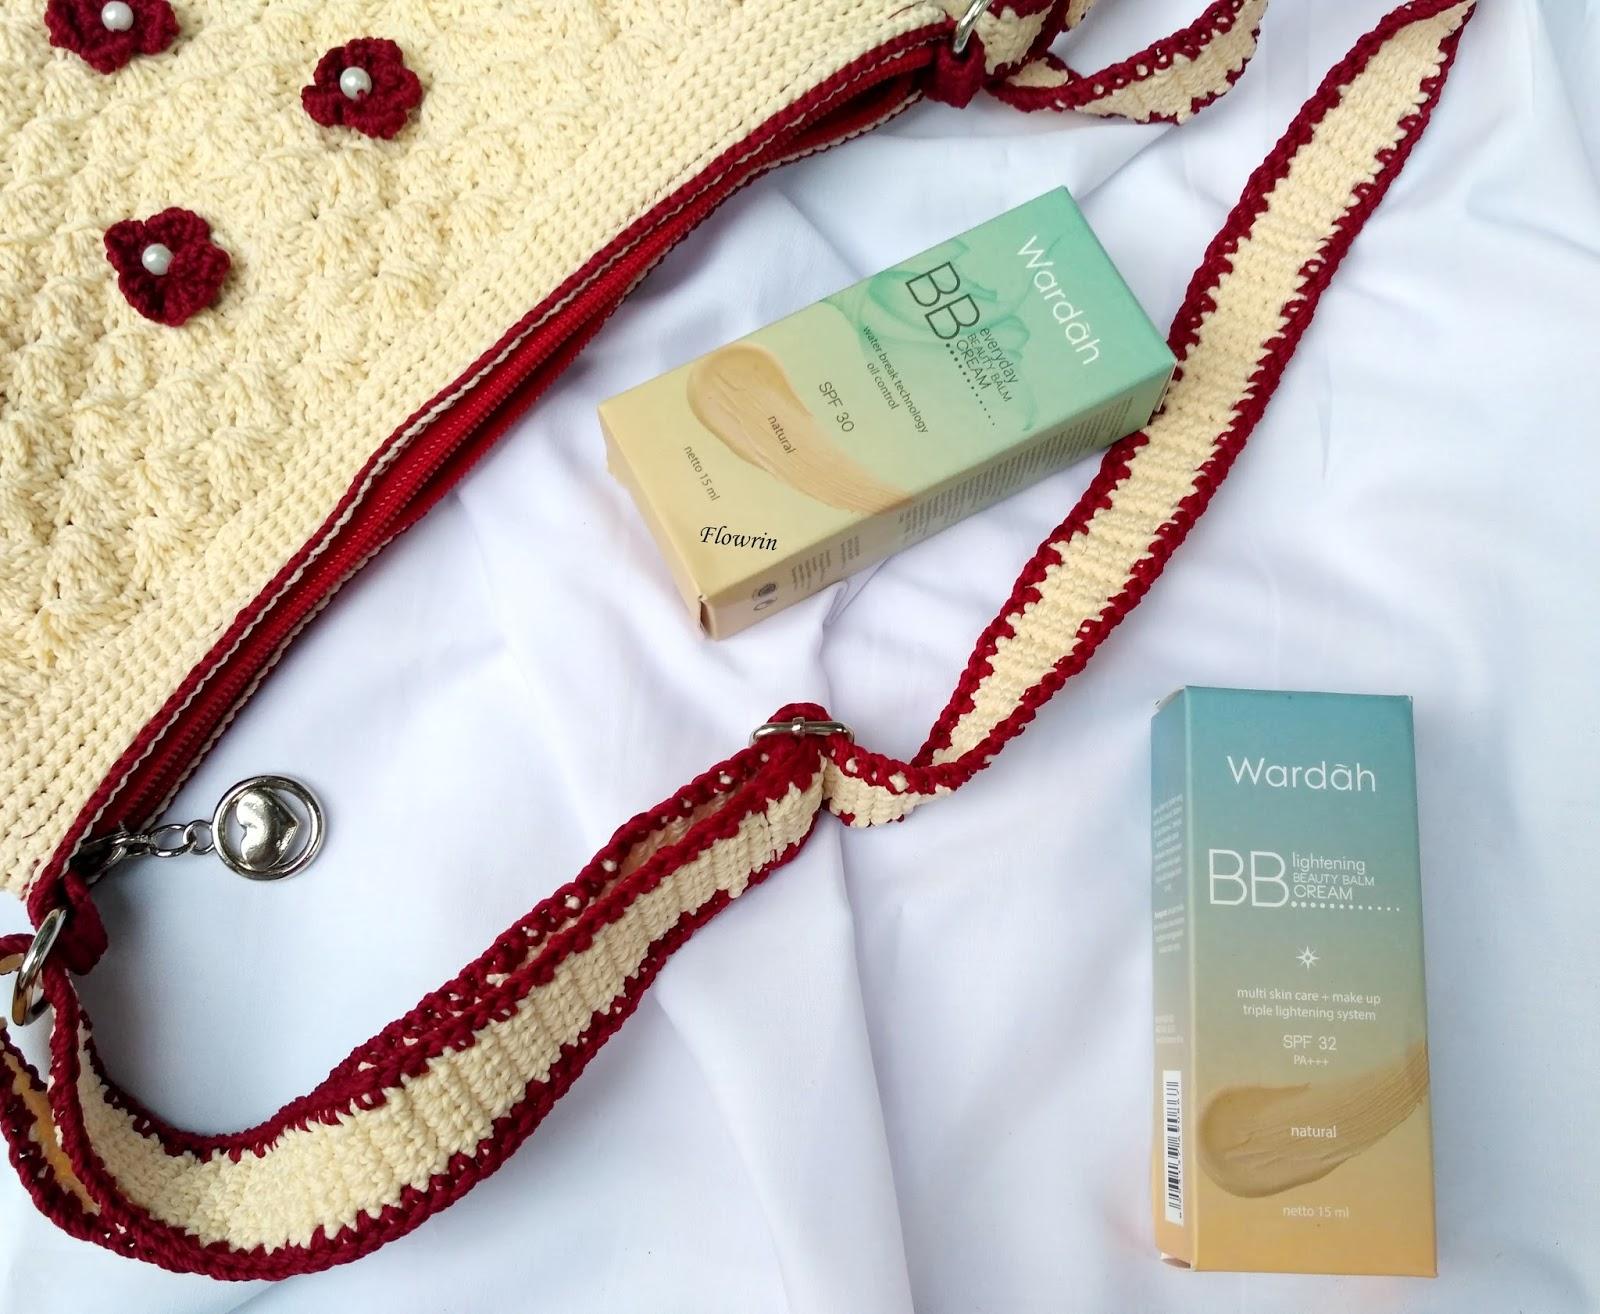 Flowrins Note Review Comparison Wardah Everyday Bb Cream Vs Lightening Day 20 Ml